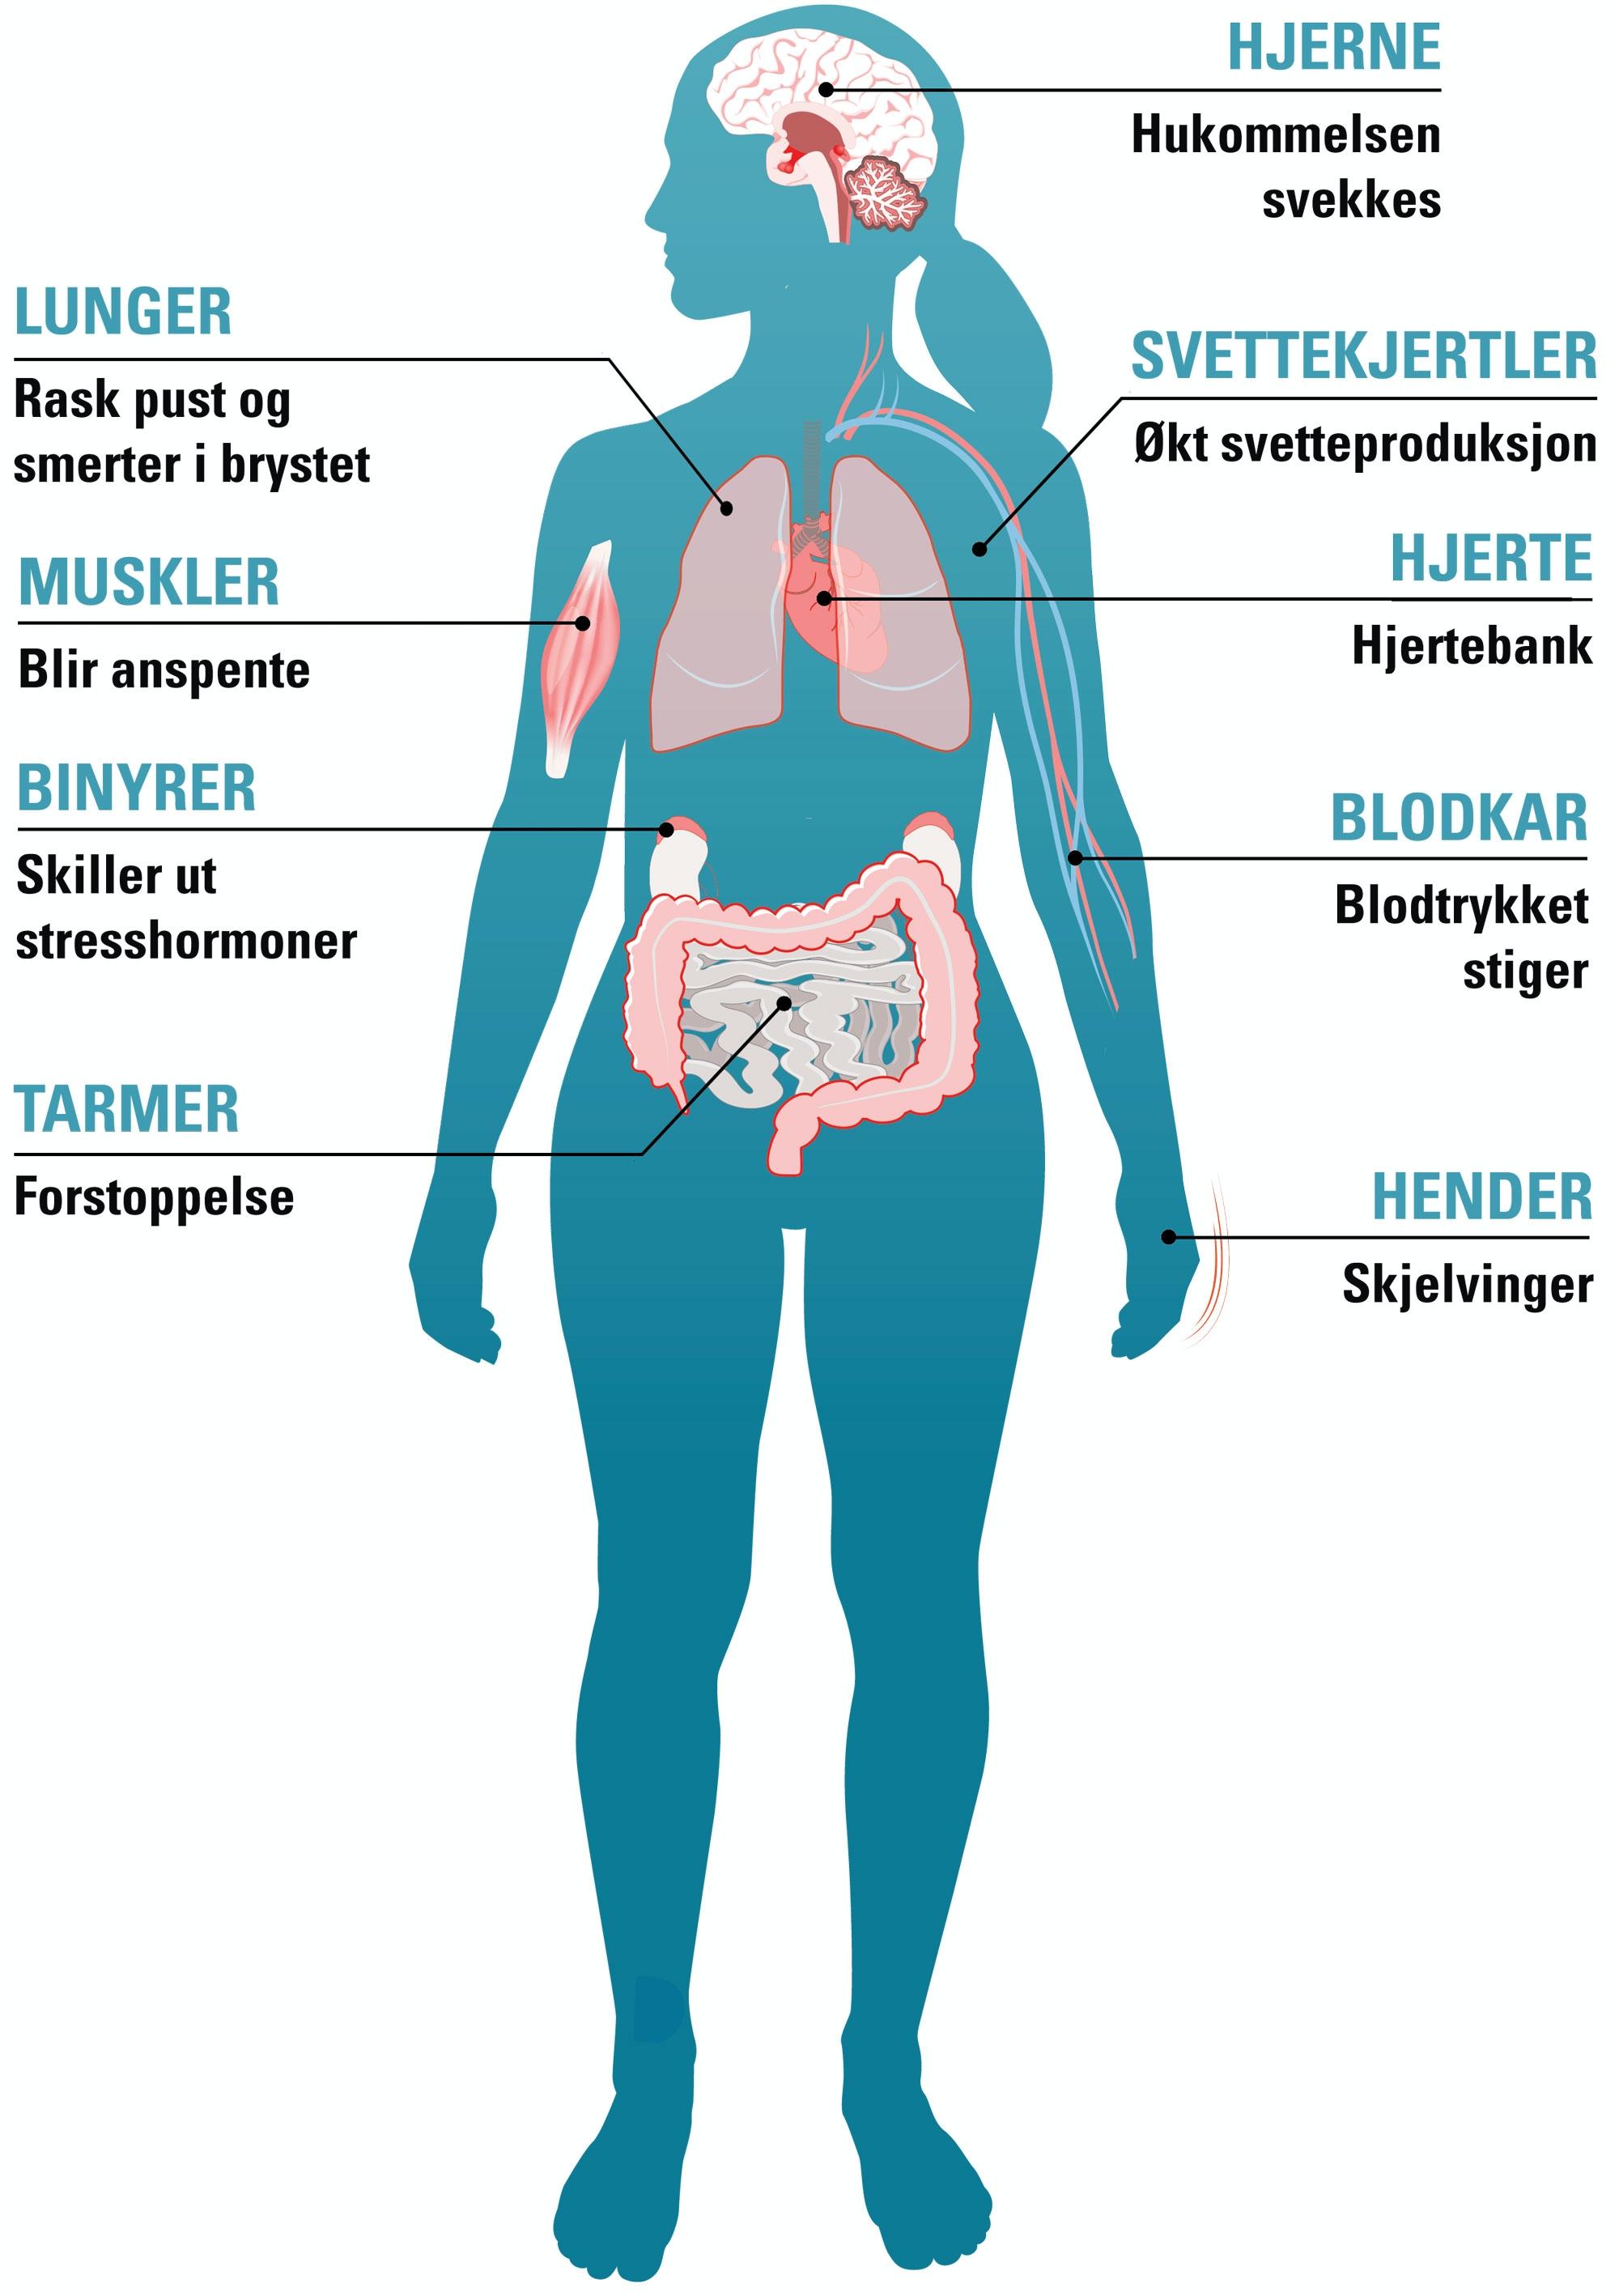 muskelsmerter i hele kroppen